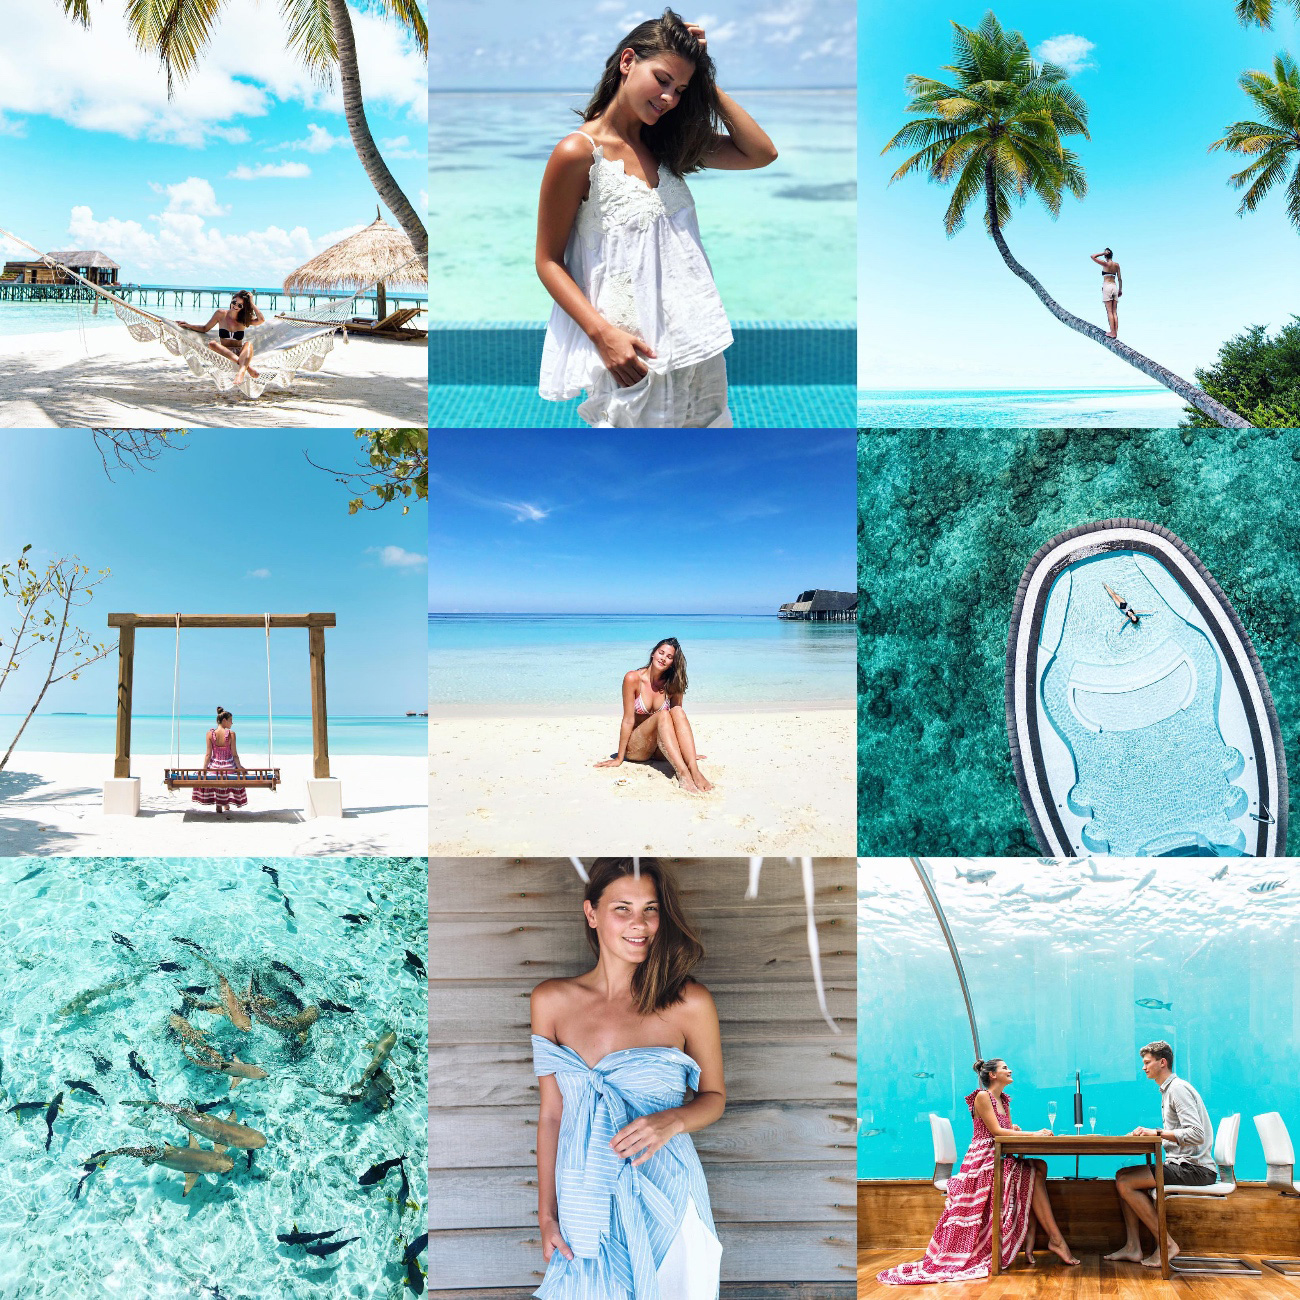 malediven-reisebericht-weekly-review-inside-fashiioncarpet